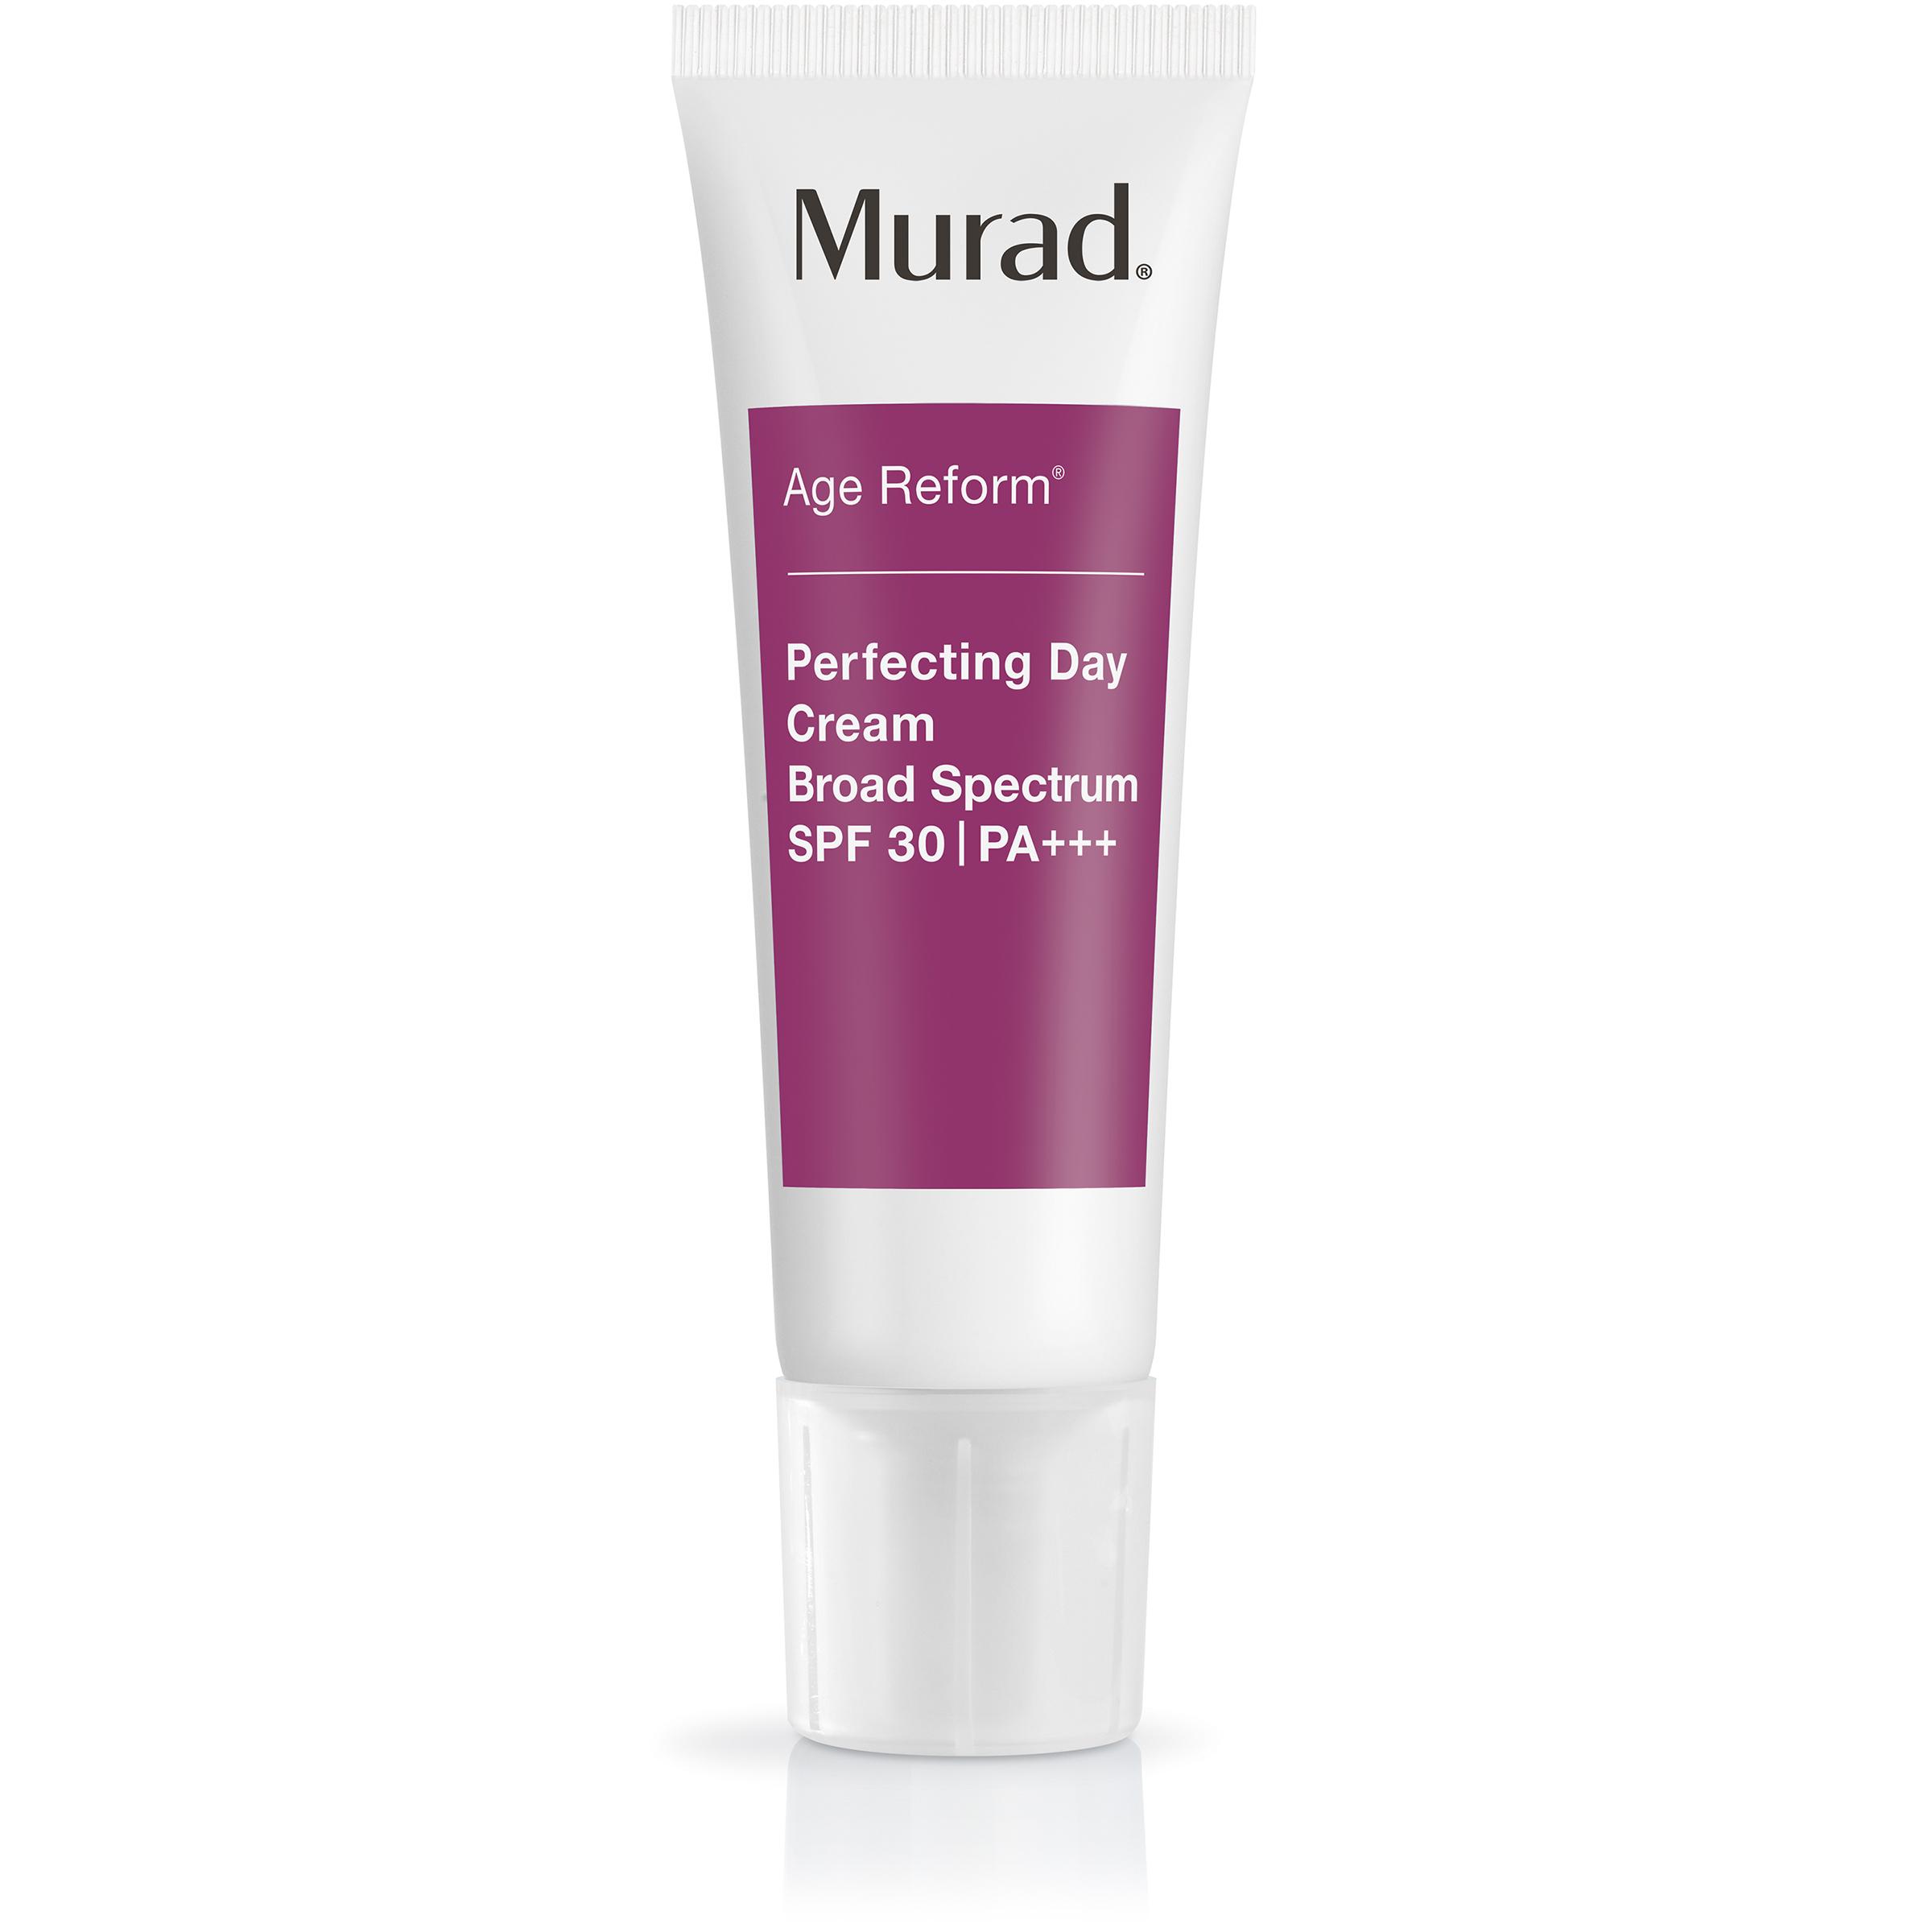 Murad Perfecting Day Cream